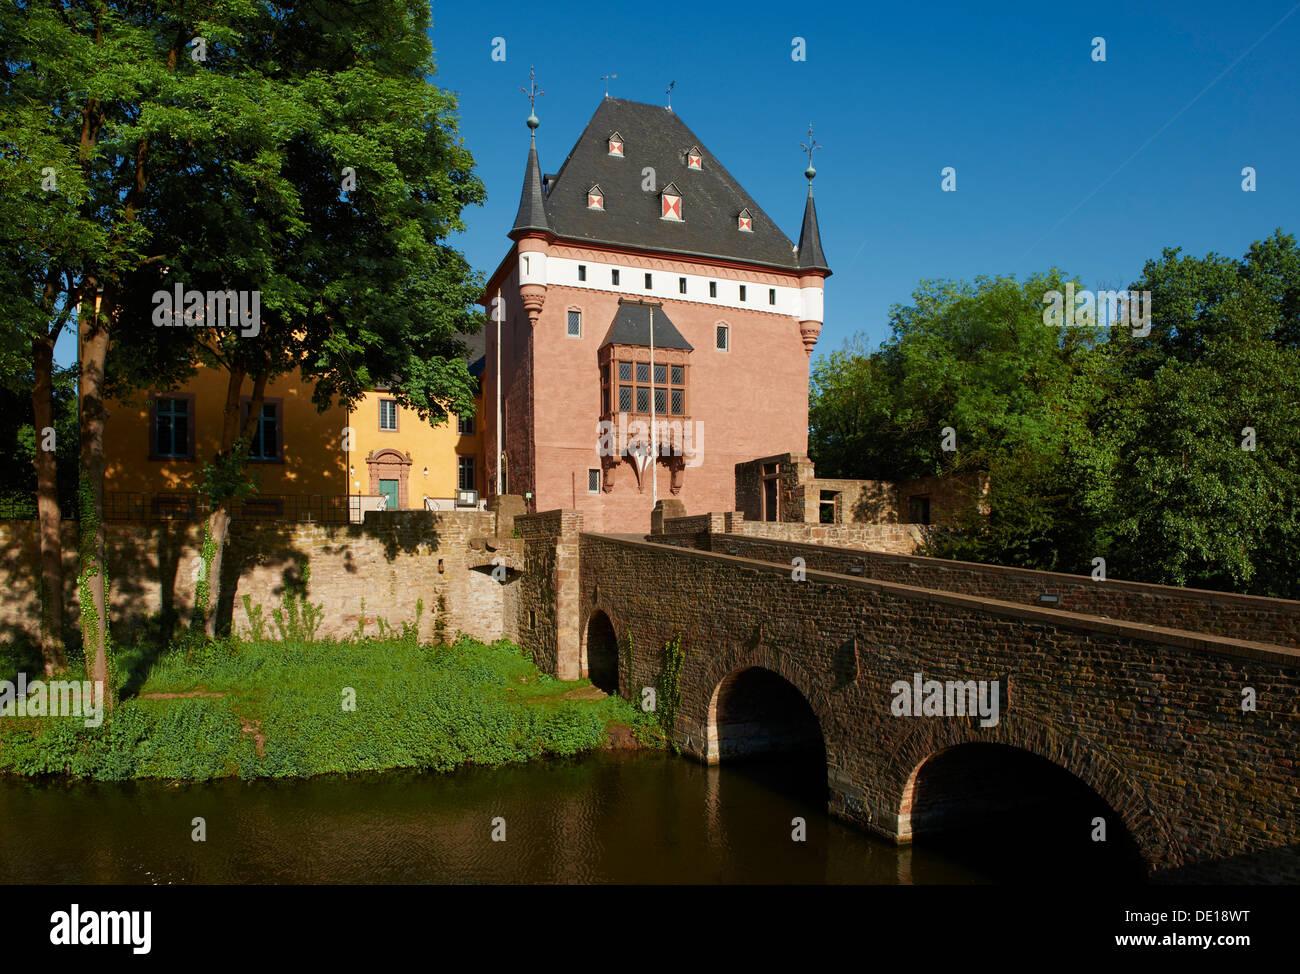 Burgau castle, Dueren, North Rhine-Westphalia, Germany Stock Photo